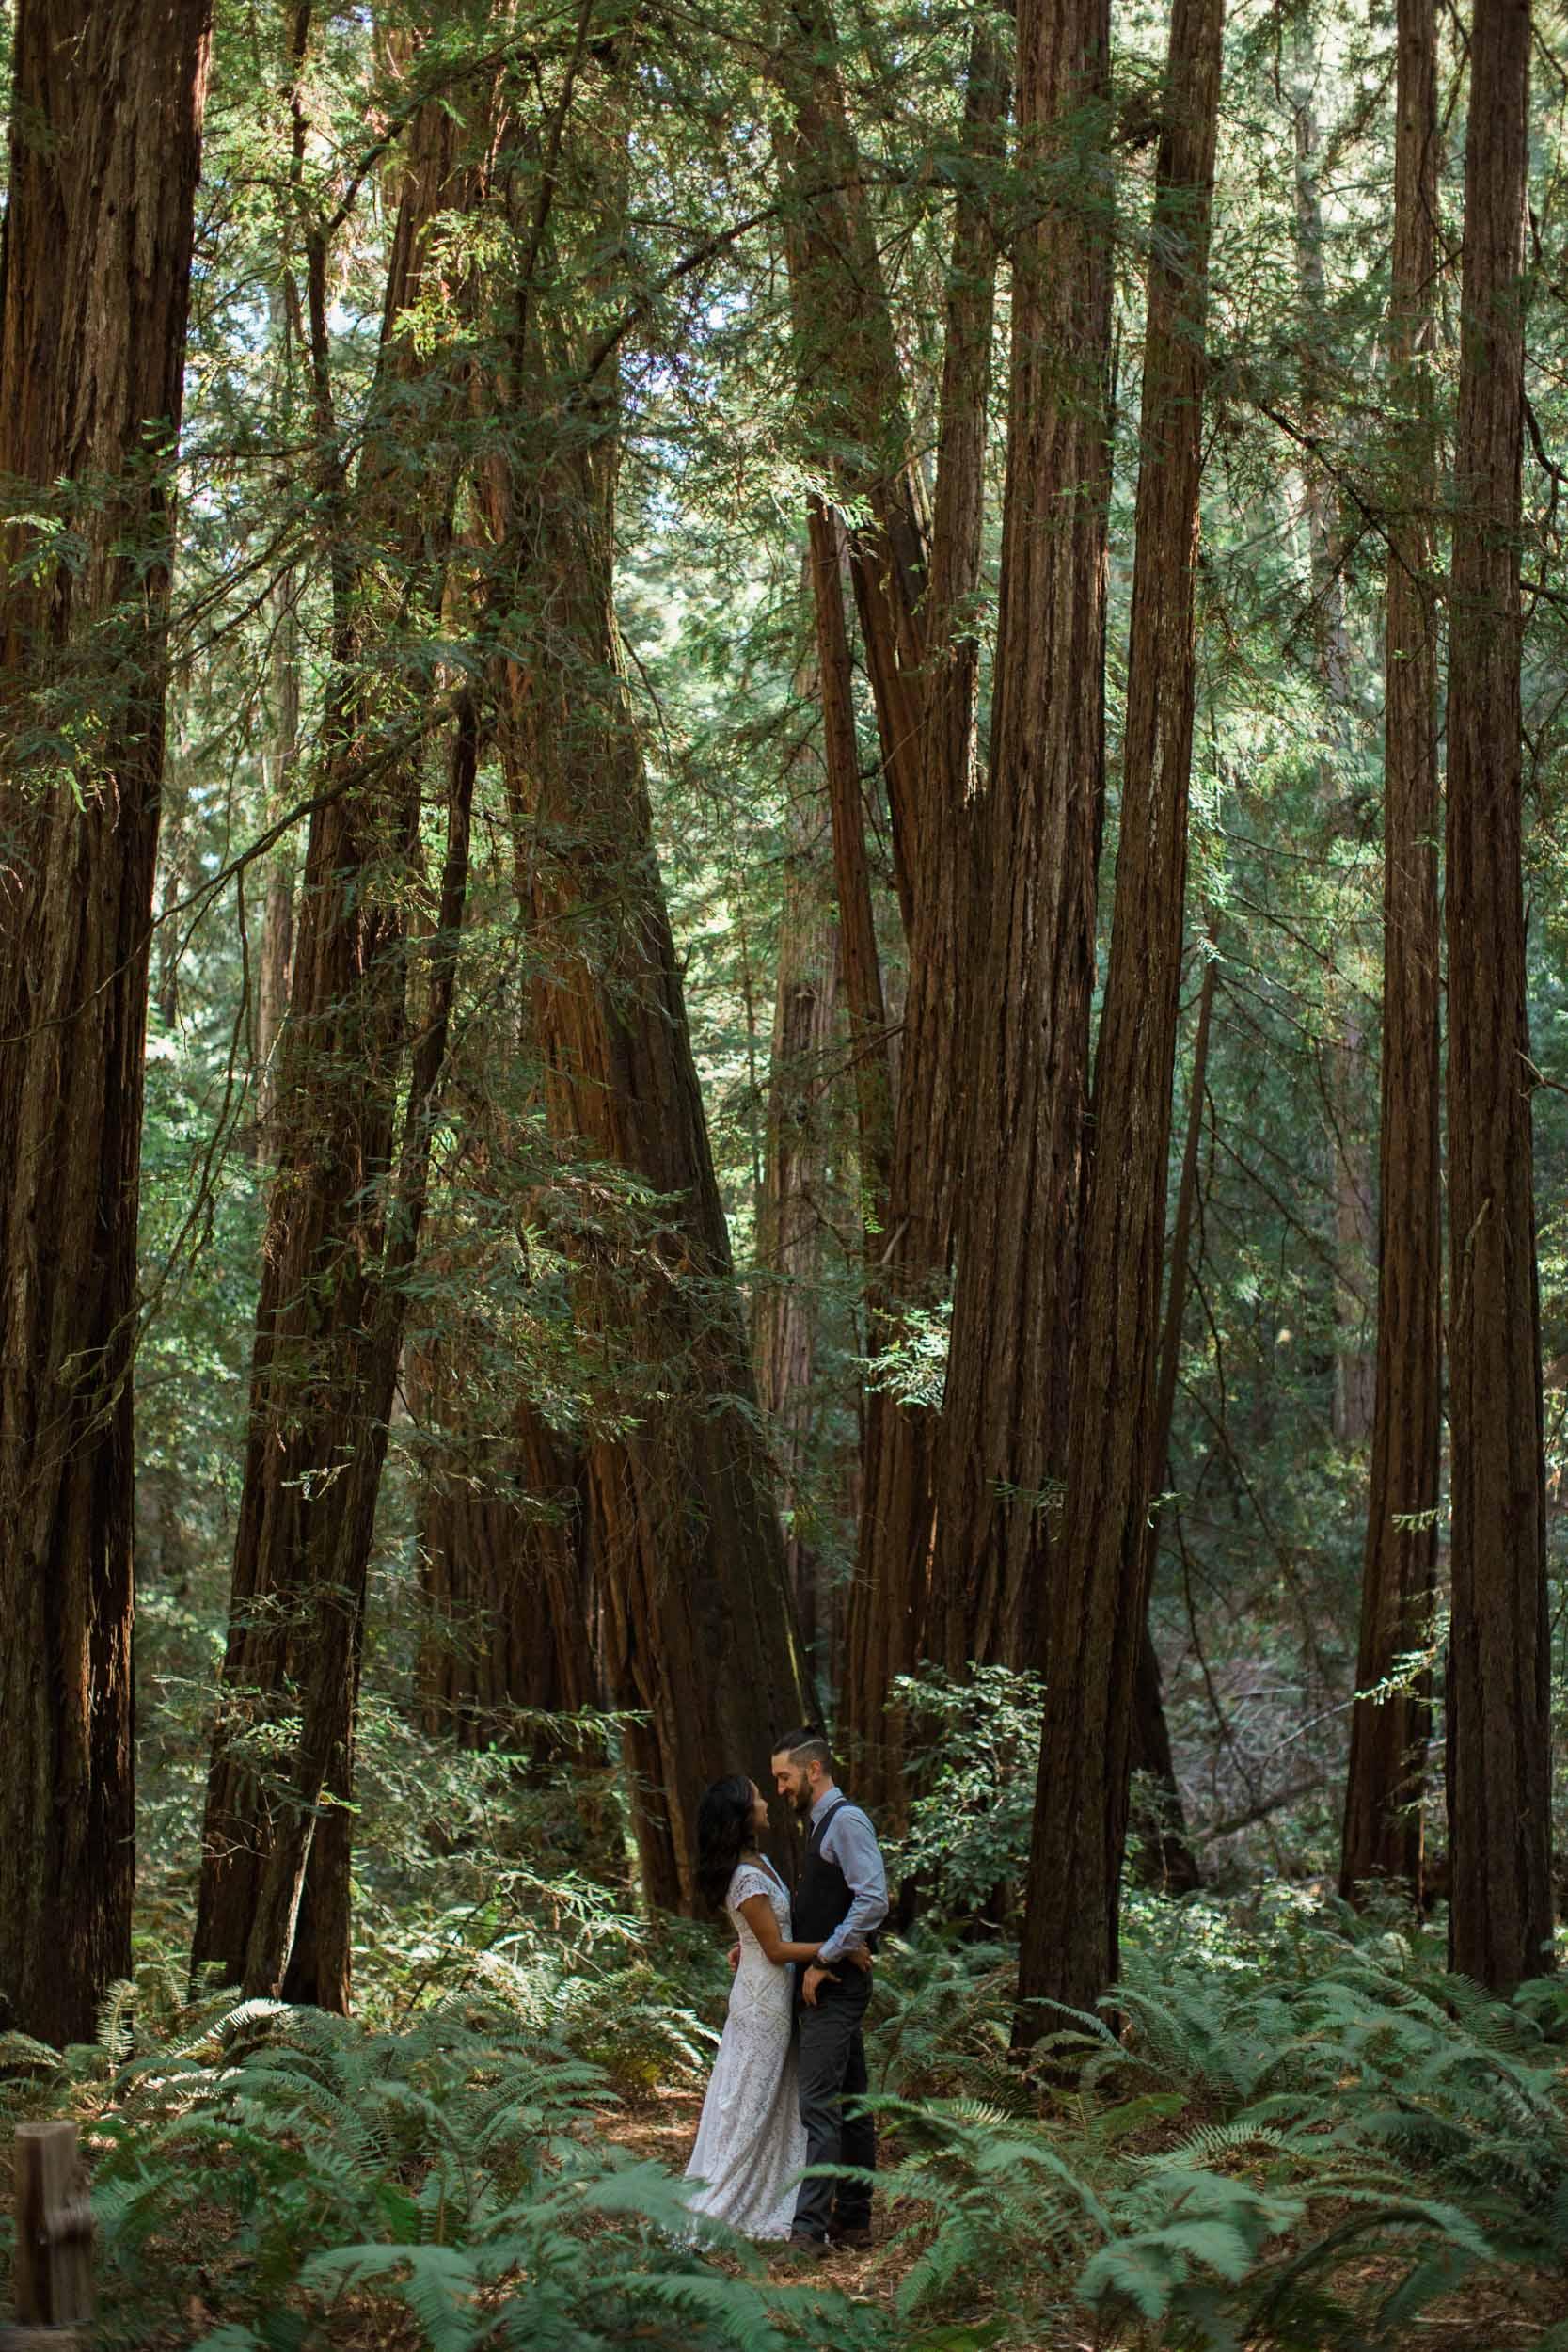 BKM-Photography-Russian-River-Redwoods-California-Wedding-Photographer-1050-2.jpg